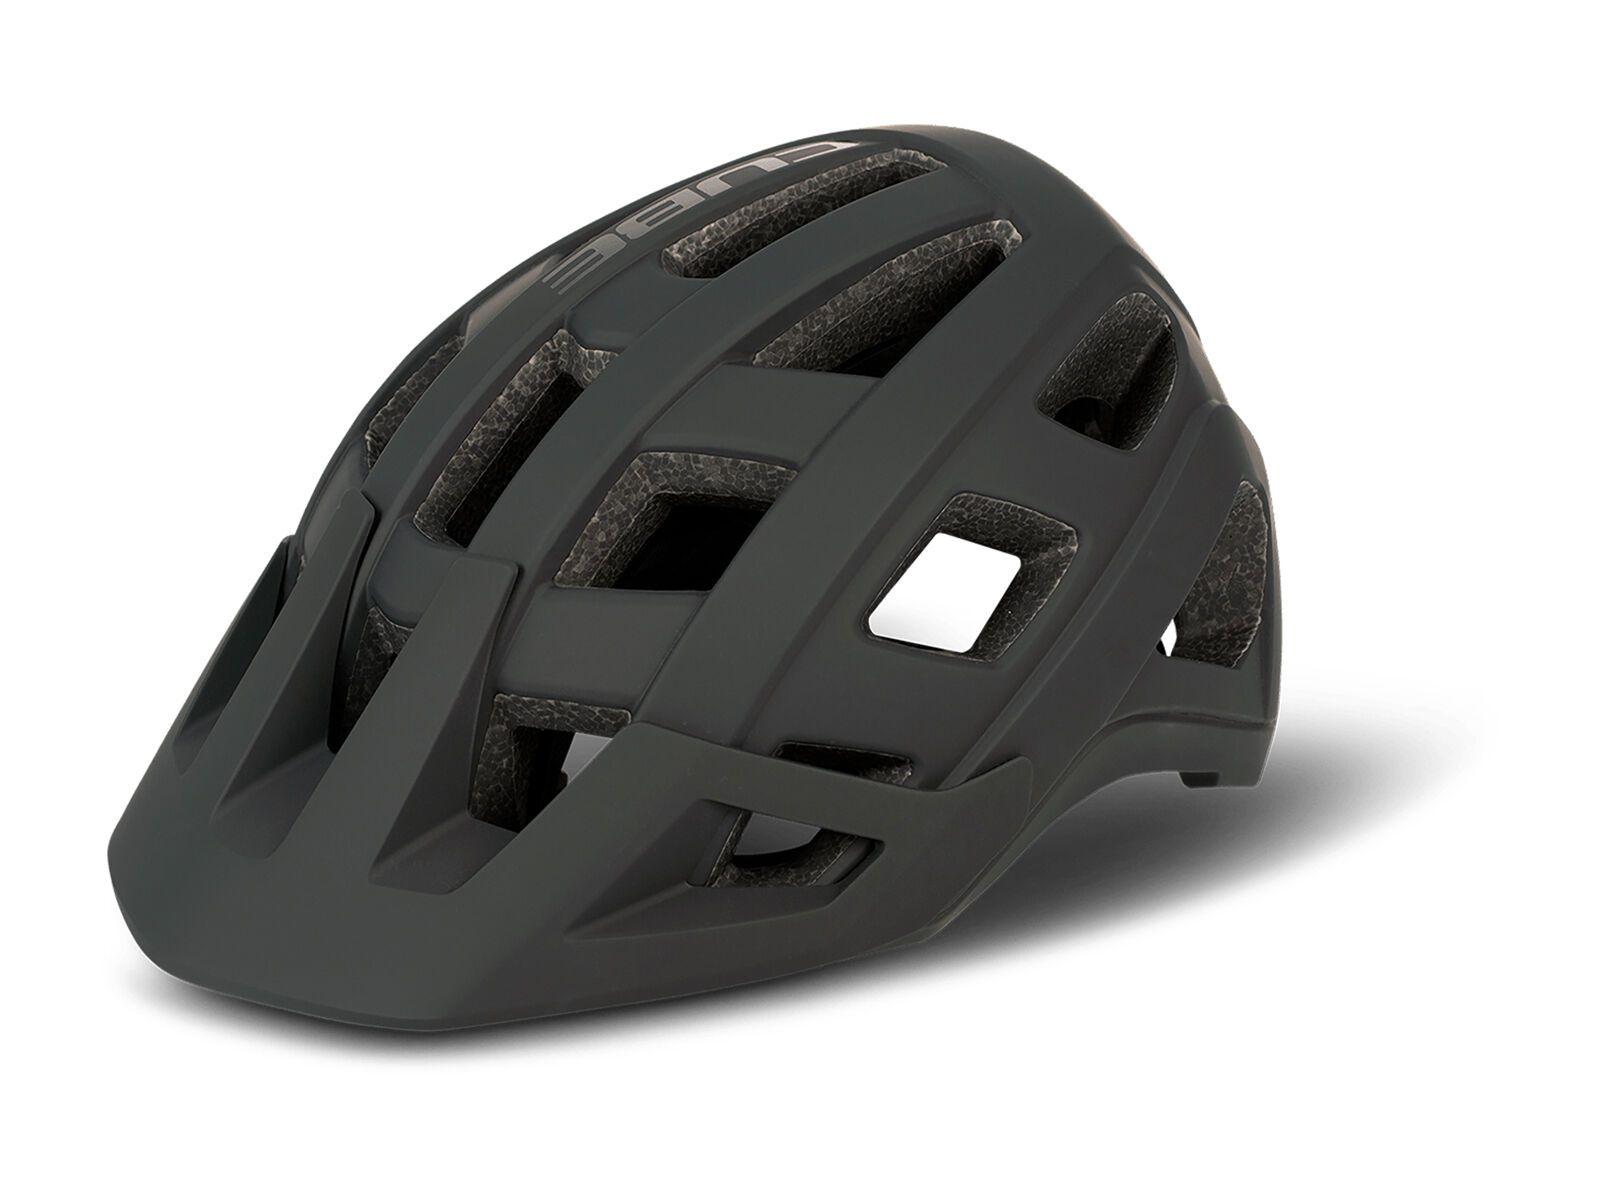 Cube Helm Badger black S // 52-56 cm 162400286